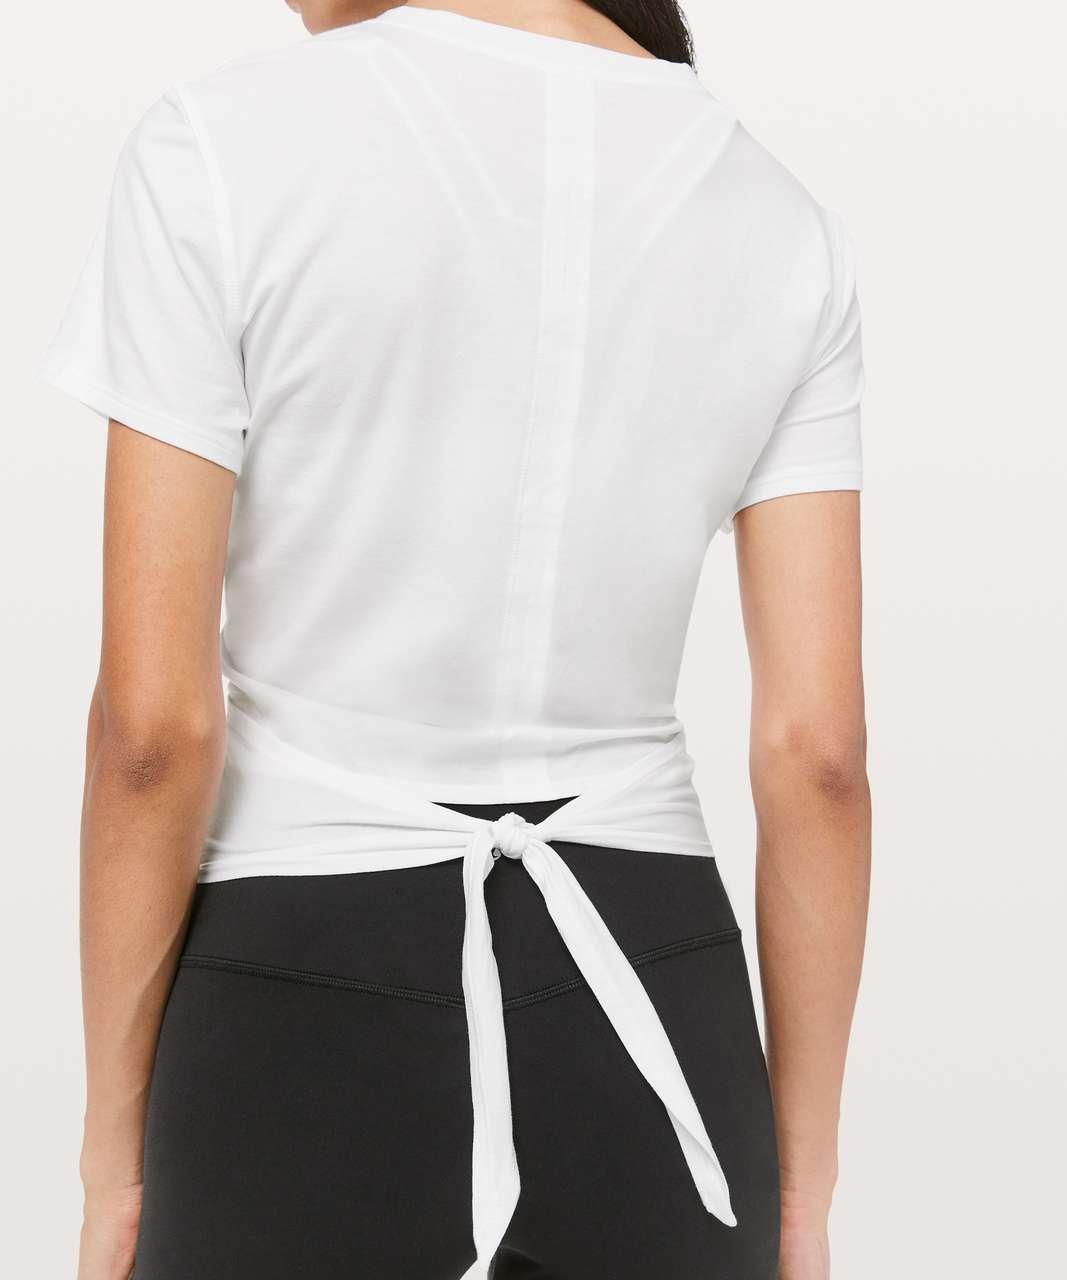 Lululemon Time To Restore Short Sleeve - White